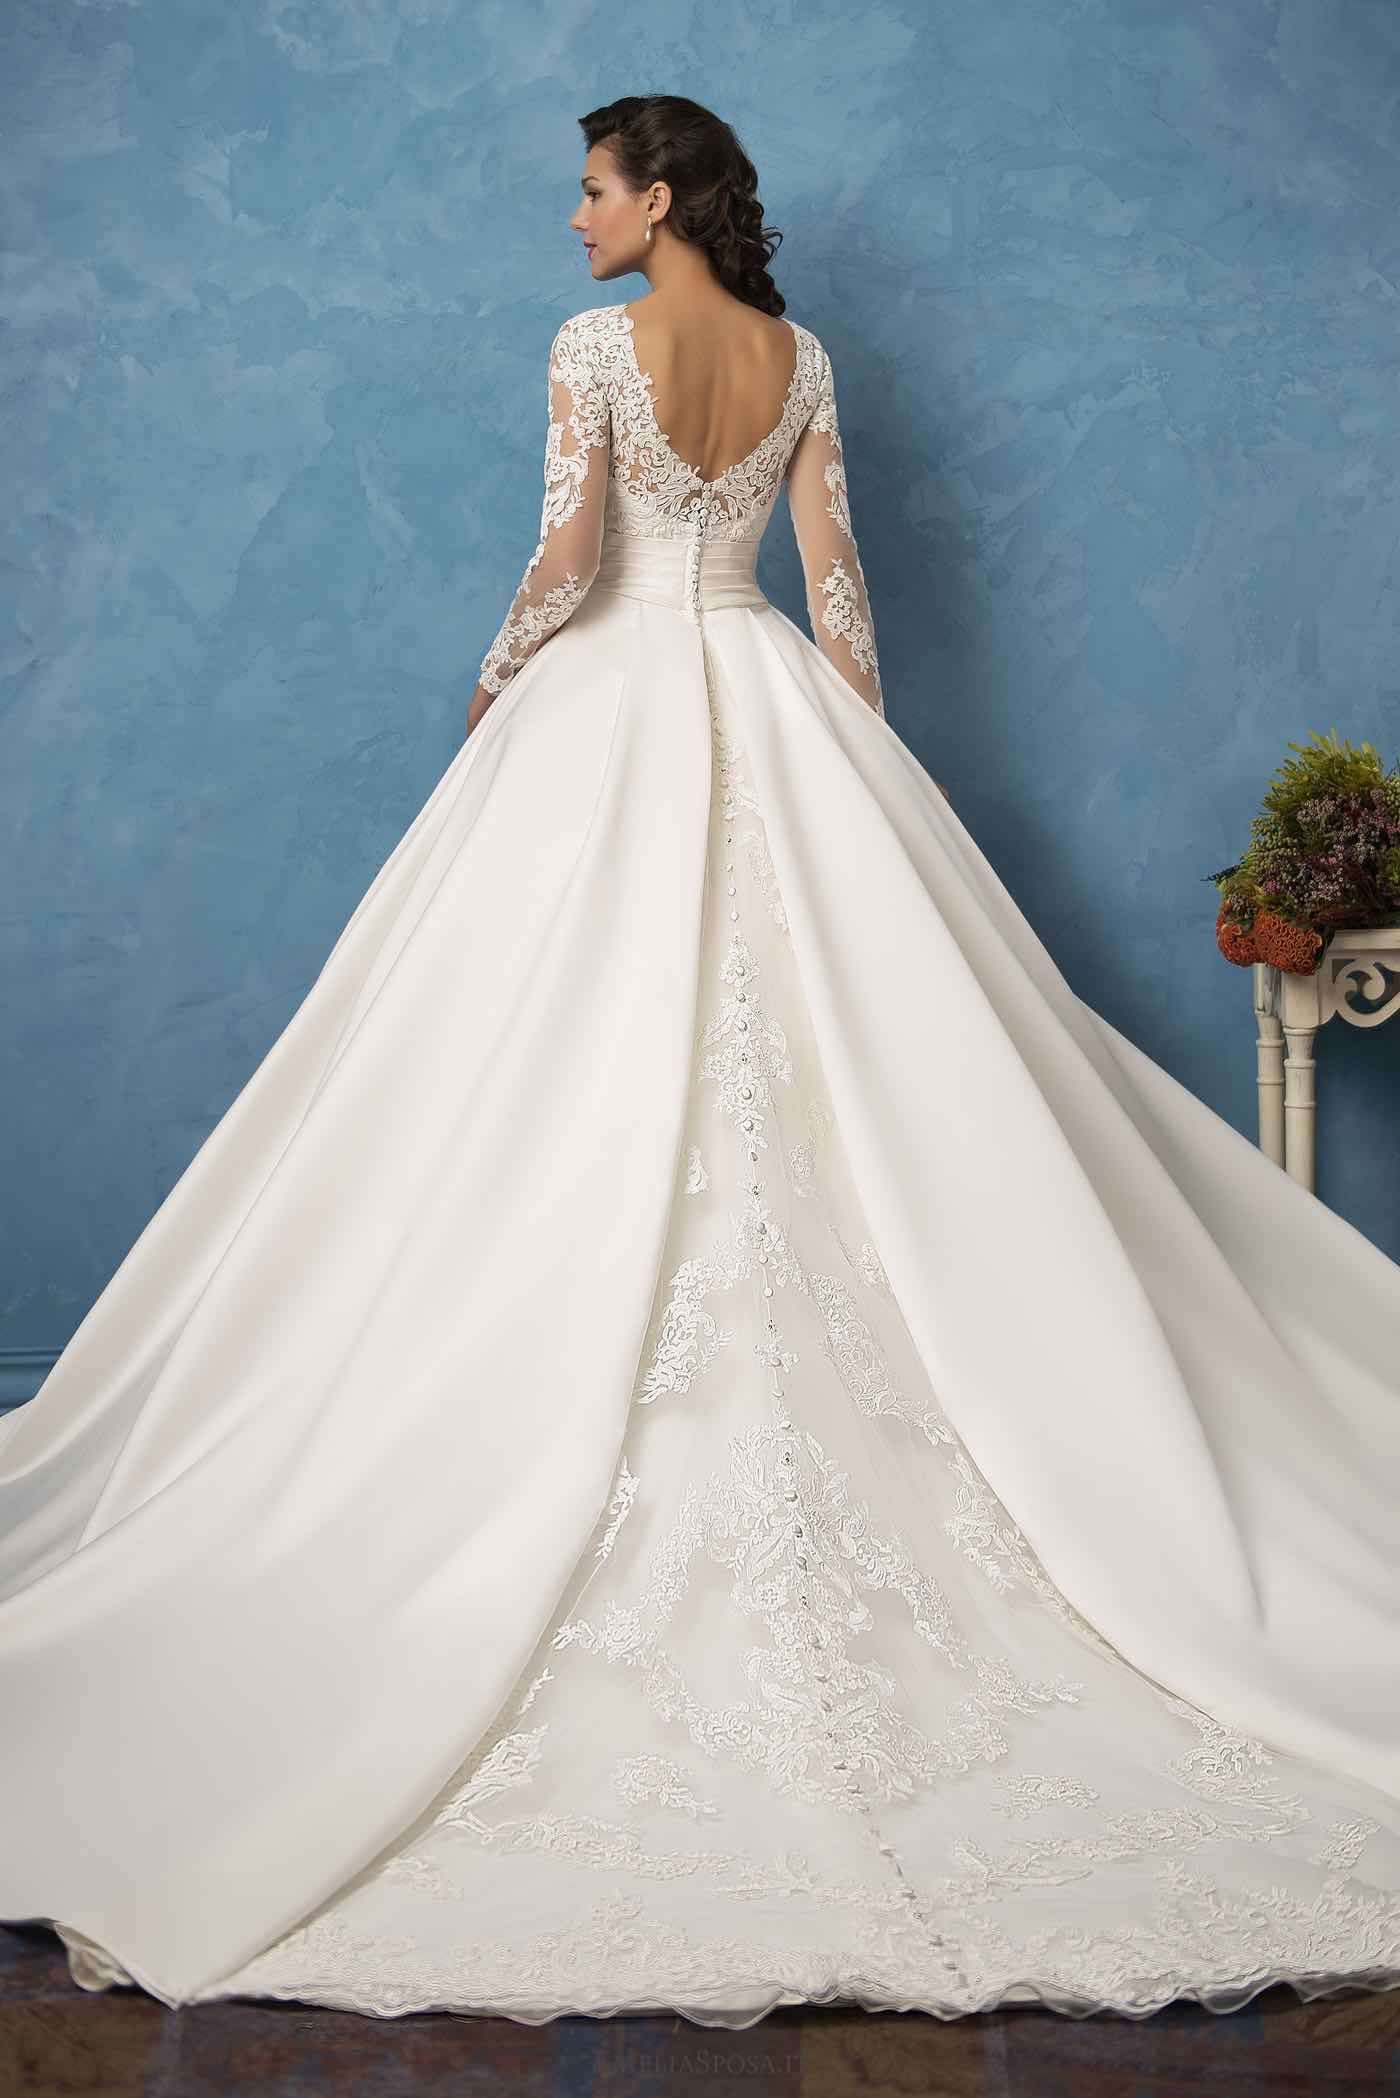 Wedding Dress Inspiration Amelia Sposa Modwedding Amelia Sposa Wedding Dress Ball Gowns Wedding Wedding Dresses Satin